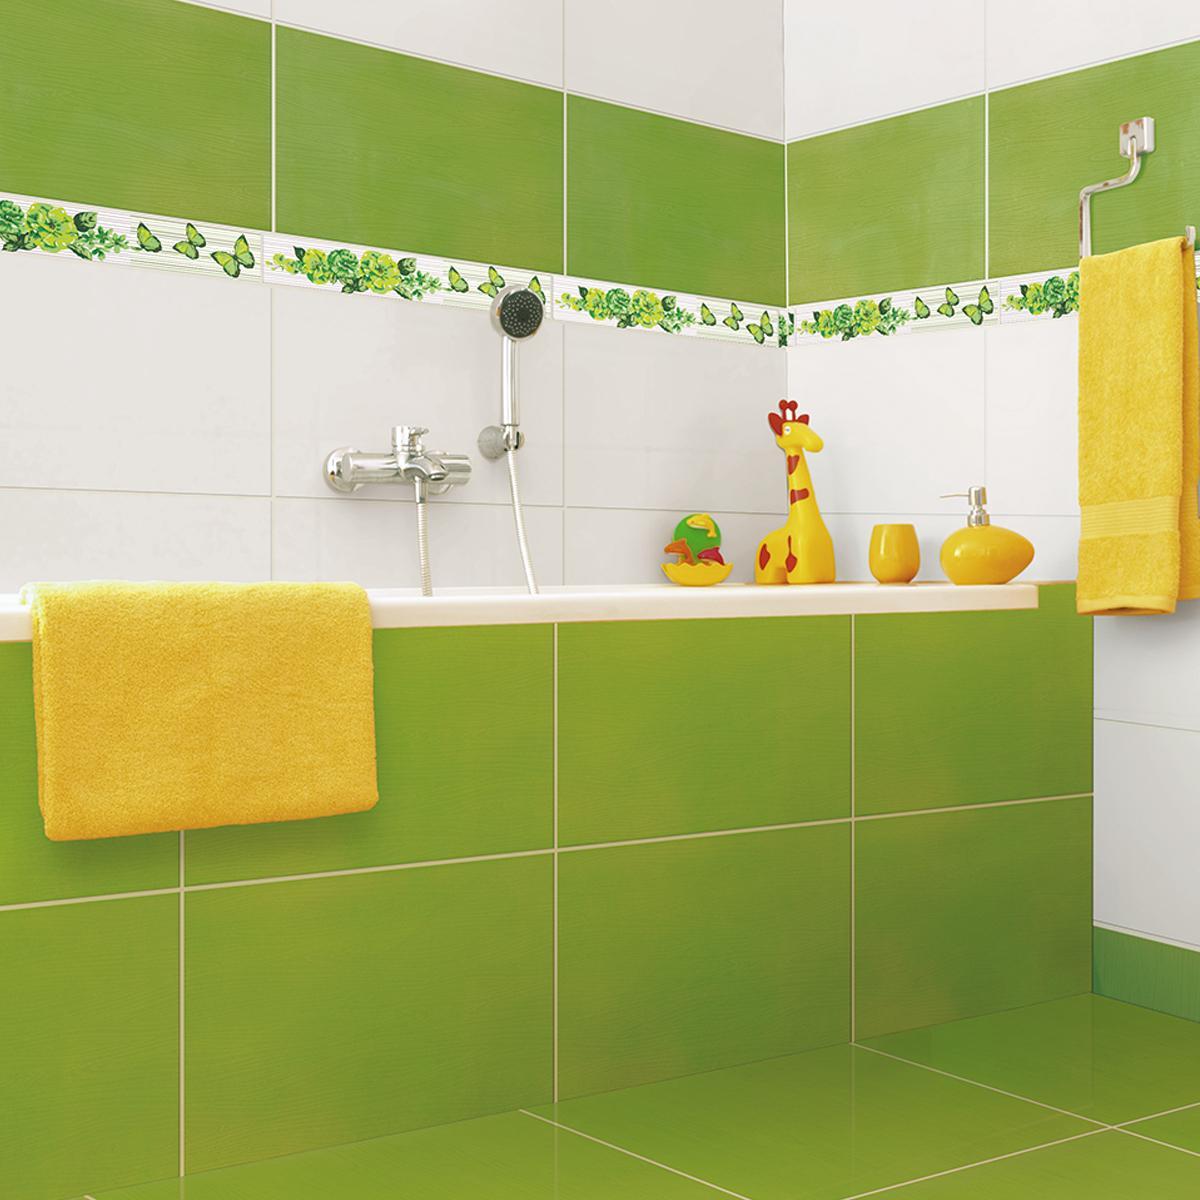 Listelo Decorado Verde Brillante - 6X39.5 cm - 1 pza